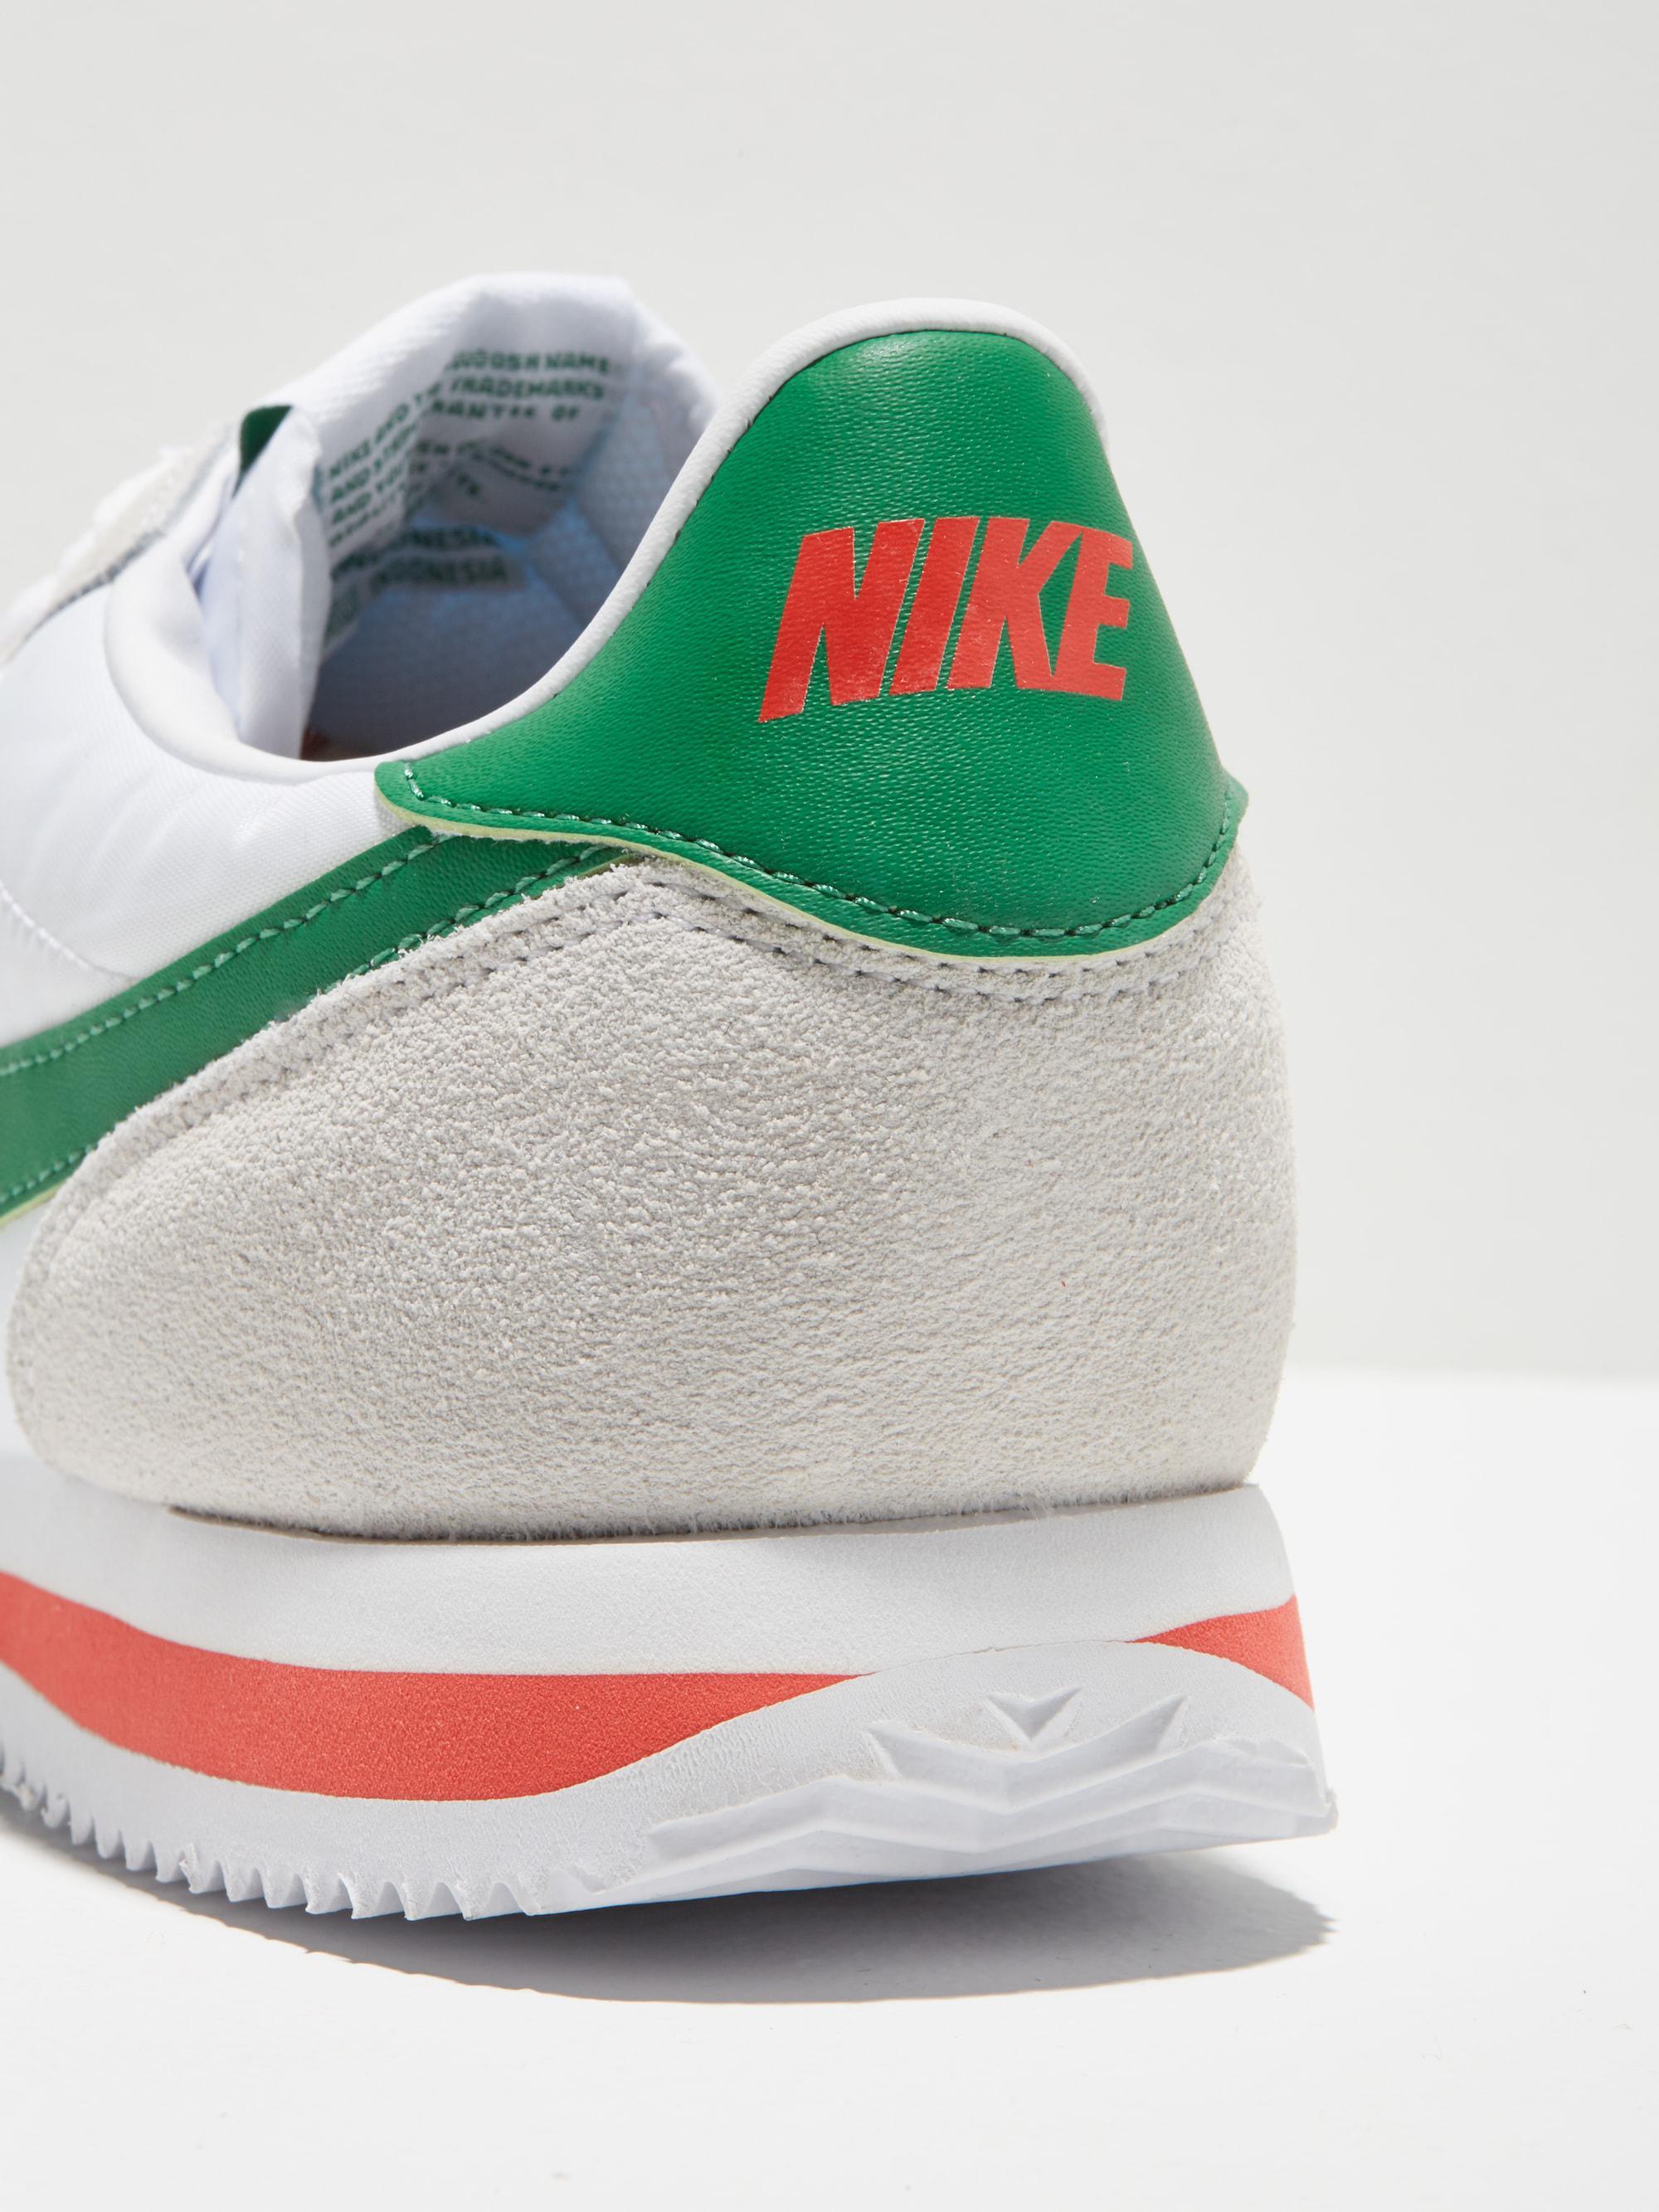 pretty nice 513dc cbbf6 ... Lyst - Frank And Oak Nike Cortez Basic Nylon Shoe In White green in .